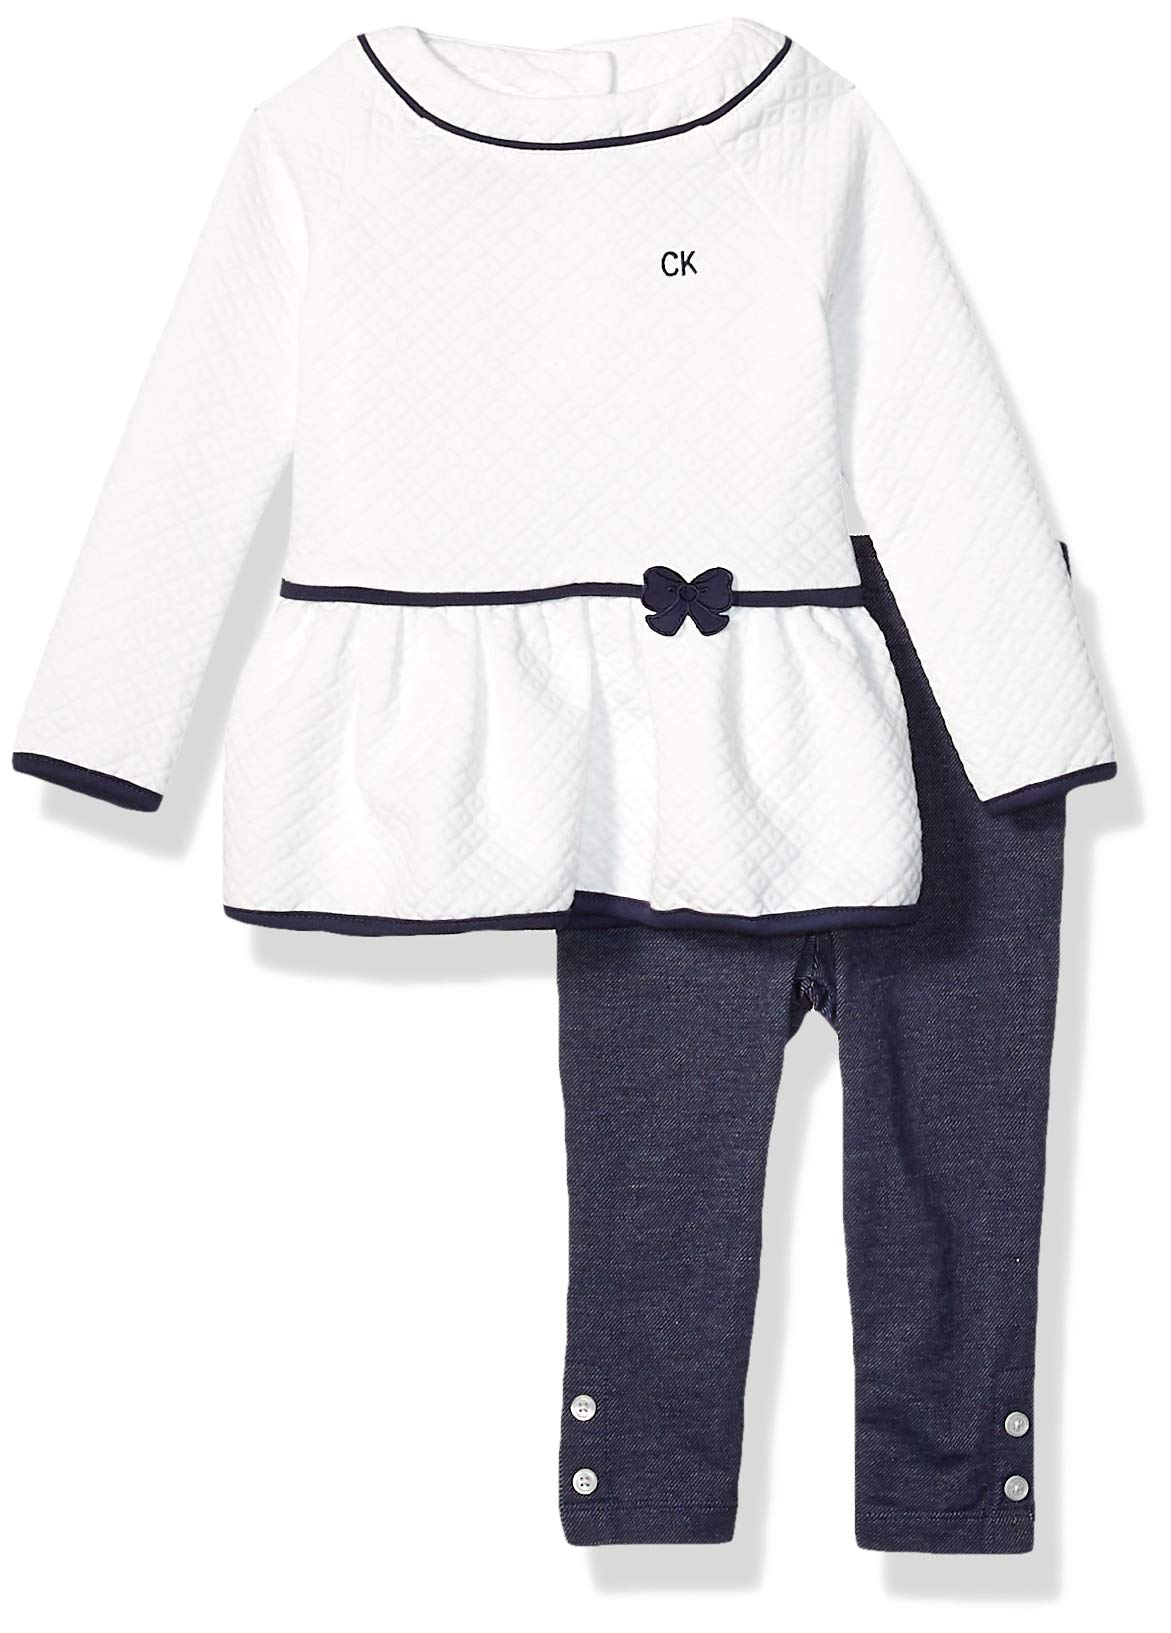 Calvin Klein Baby Girls' 2 Pieces Leggings Set